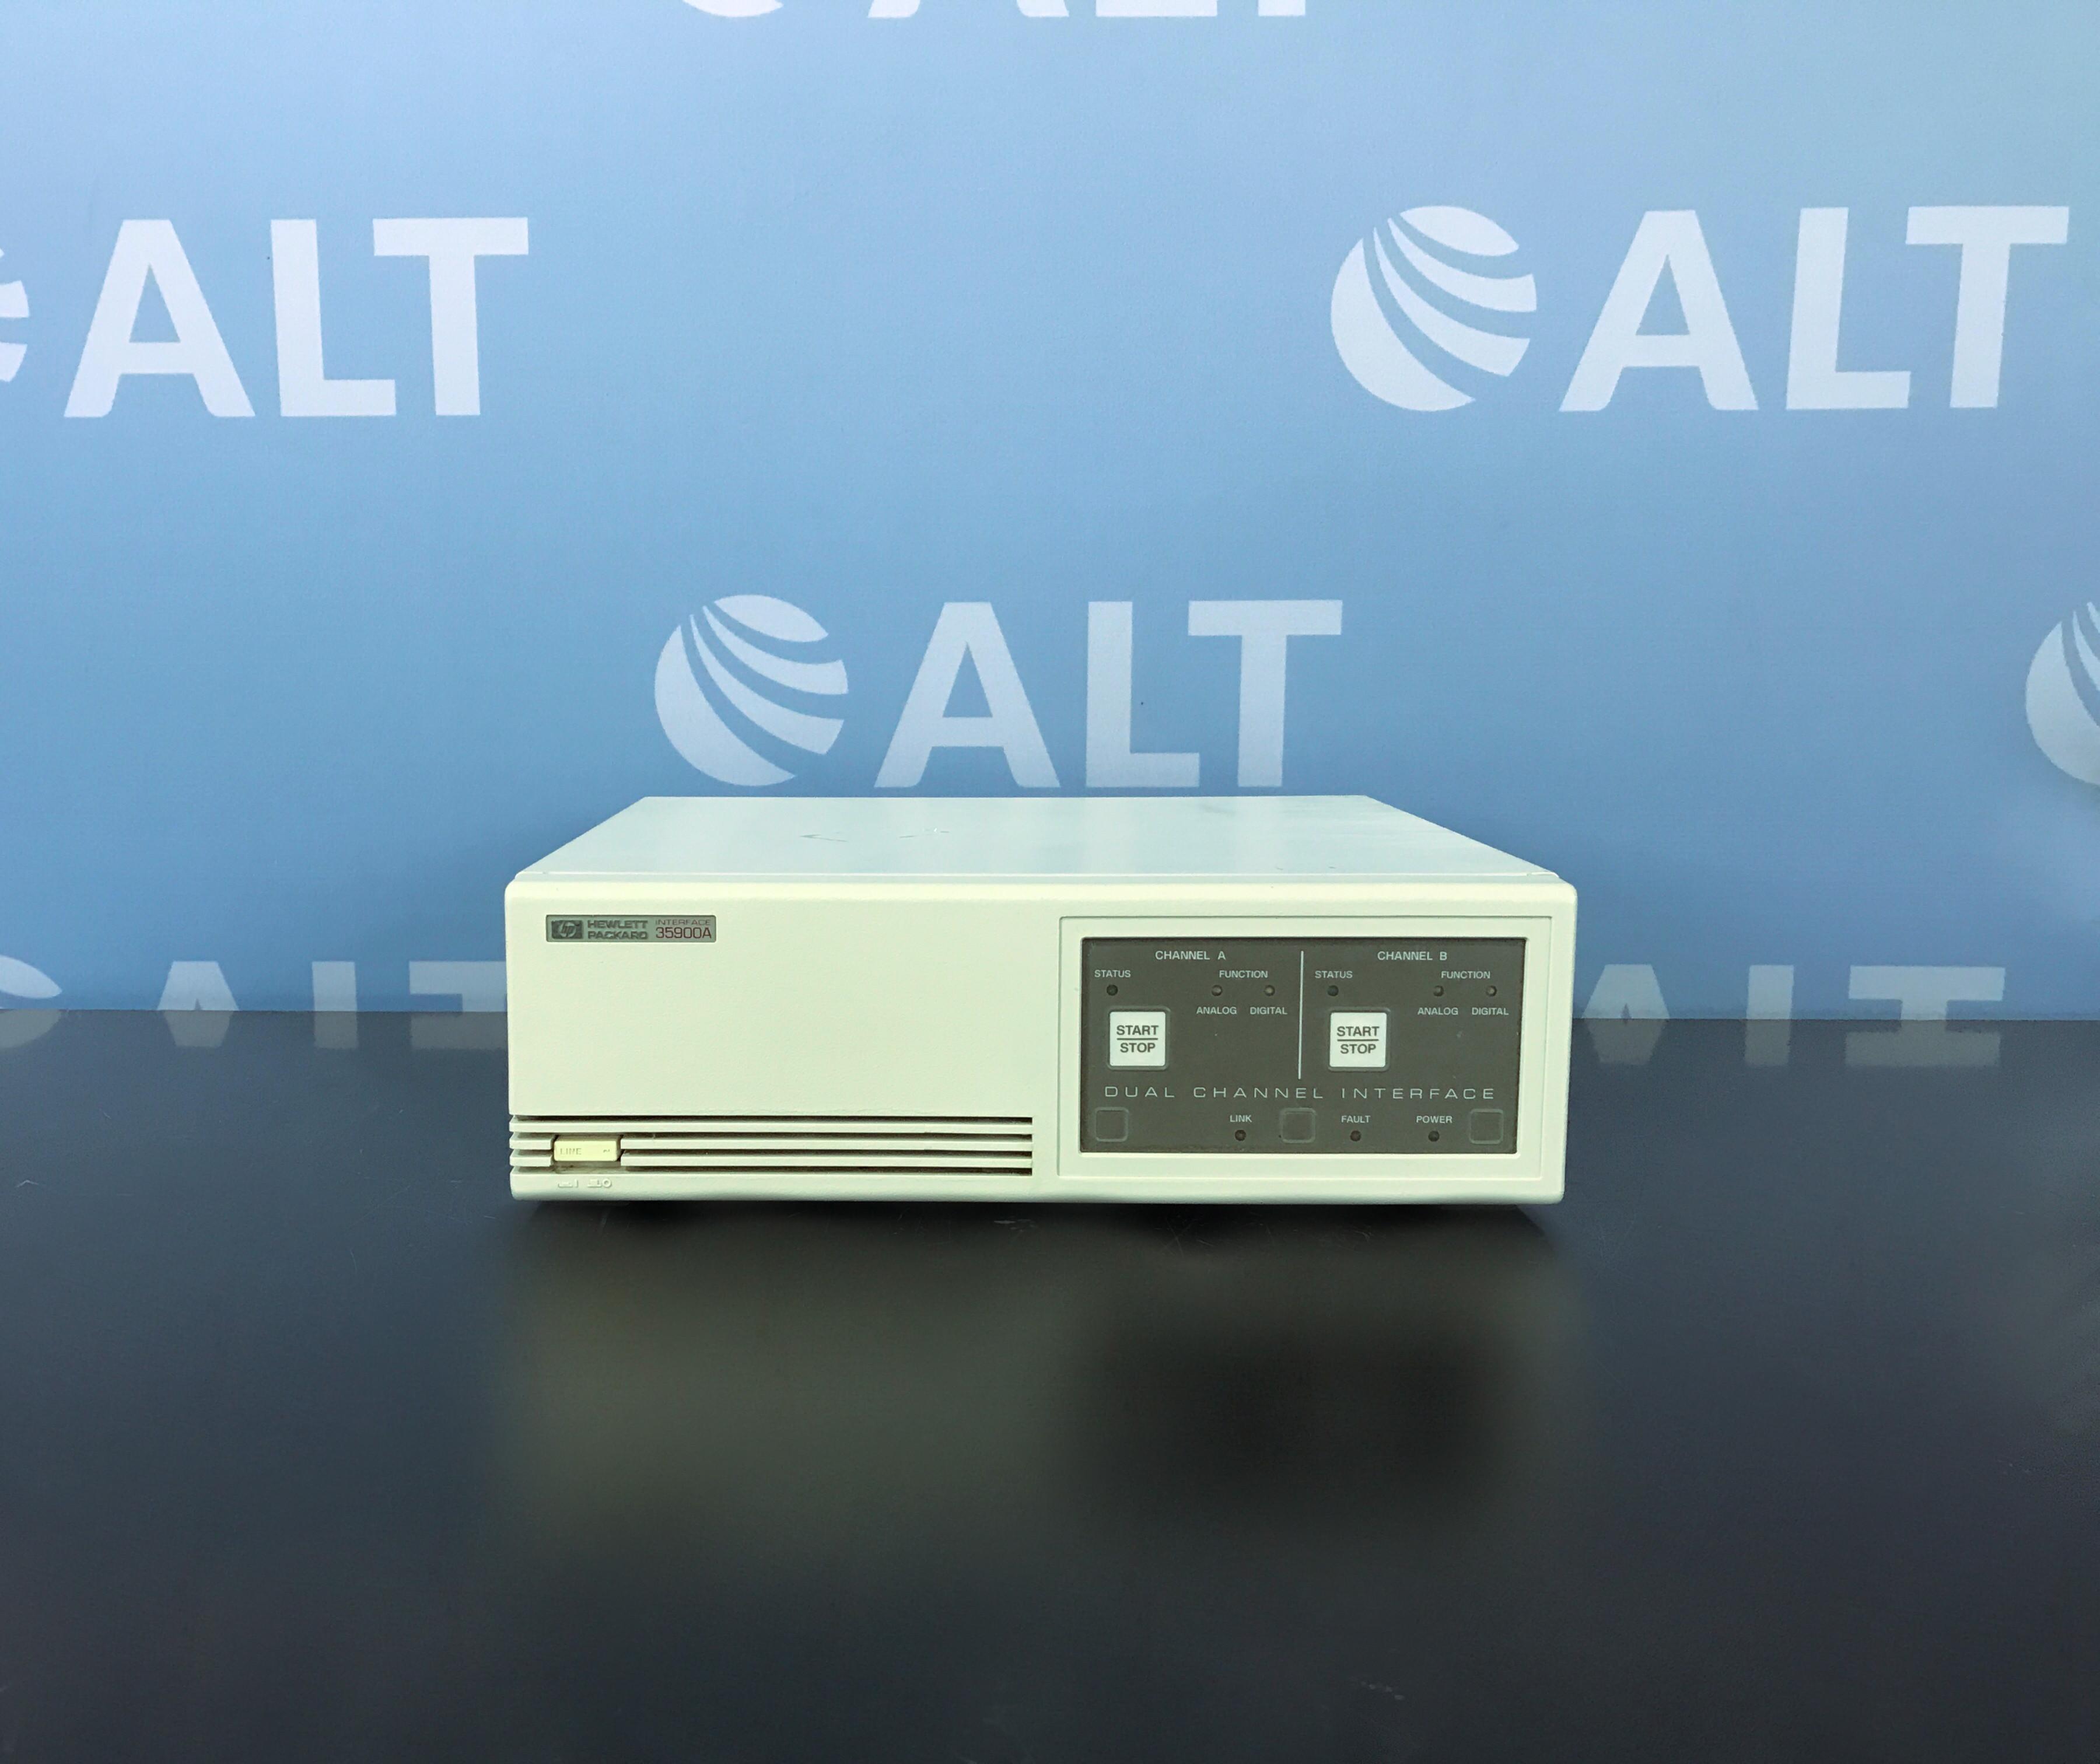 Hewlett Packard 35900A Dual Channel Interface Image